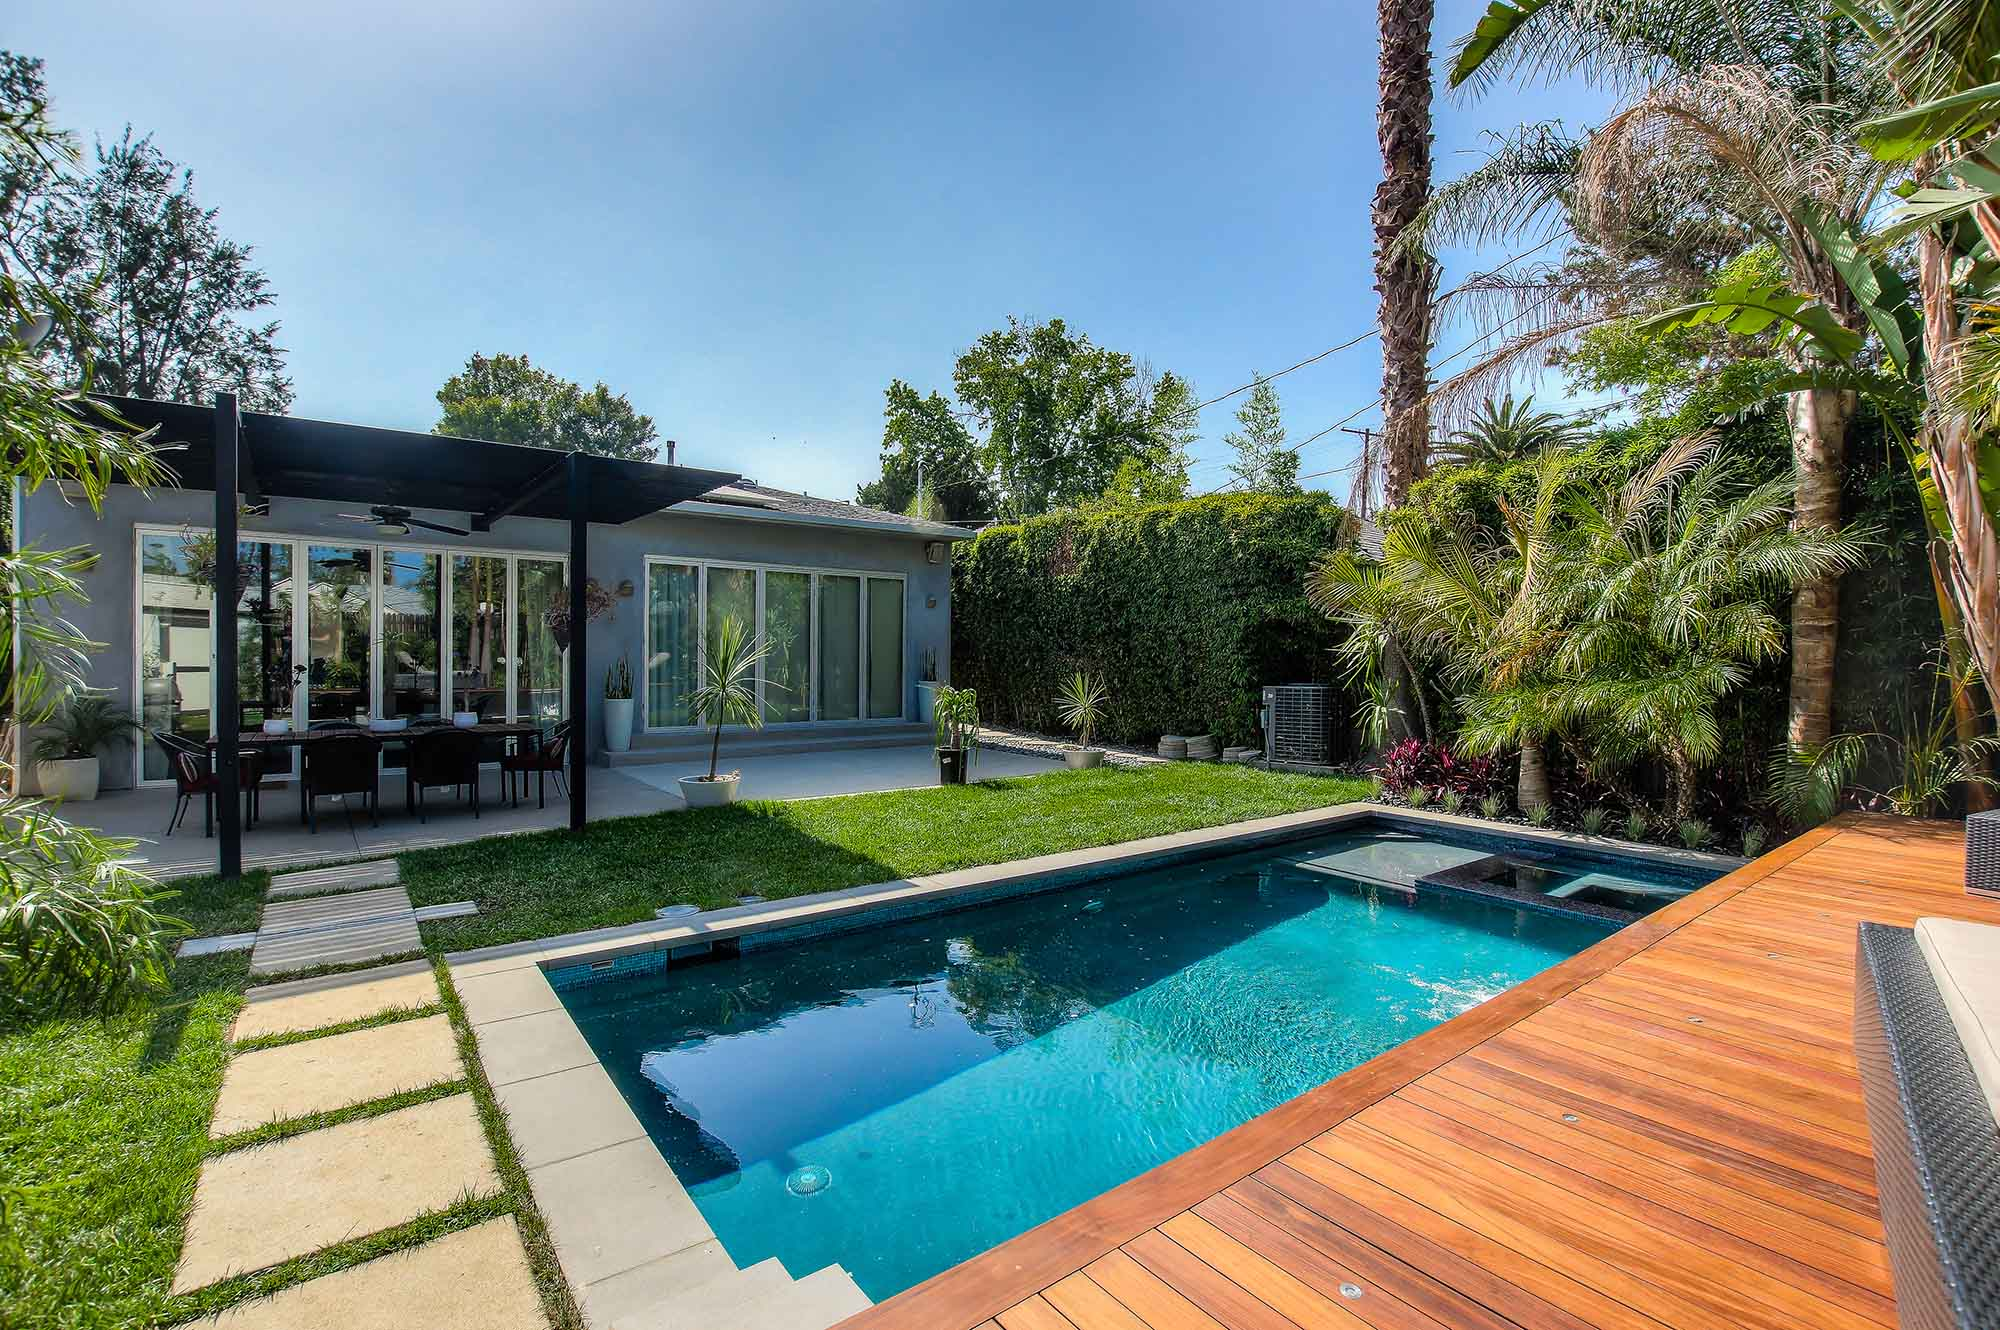 Sherman Oaks modern pool and landscape